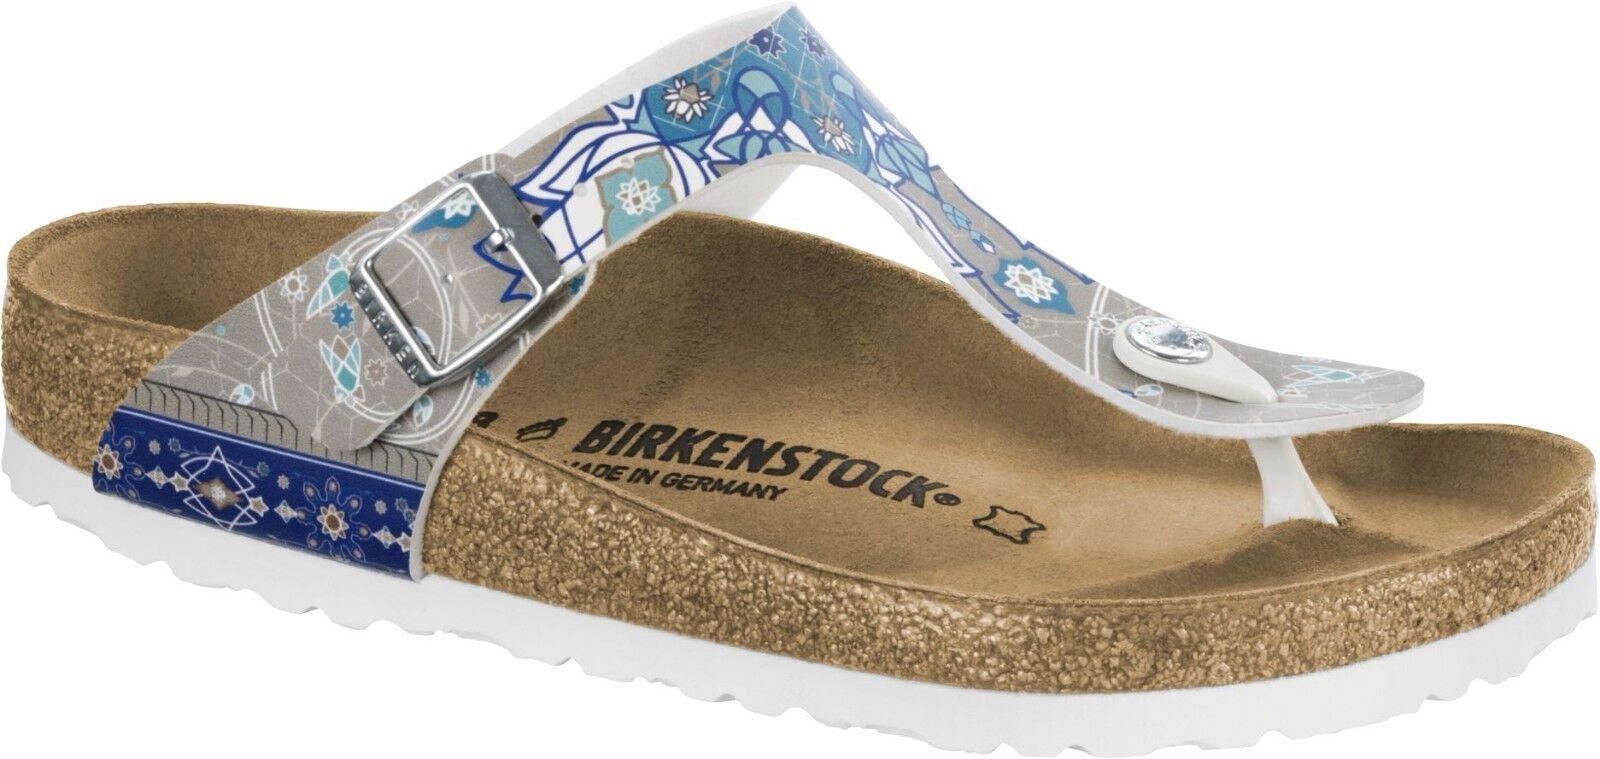 Birkenstock Gizeh Ancient 35-42 Mosaic Taupe Zehensteg Größe 35-42 Ancient Fußbett normal c5492a